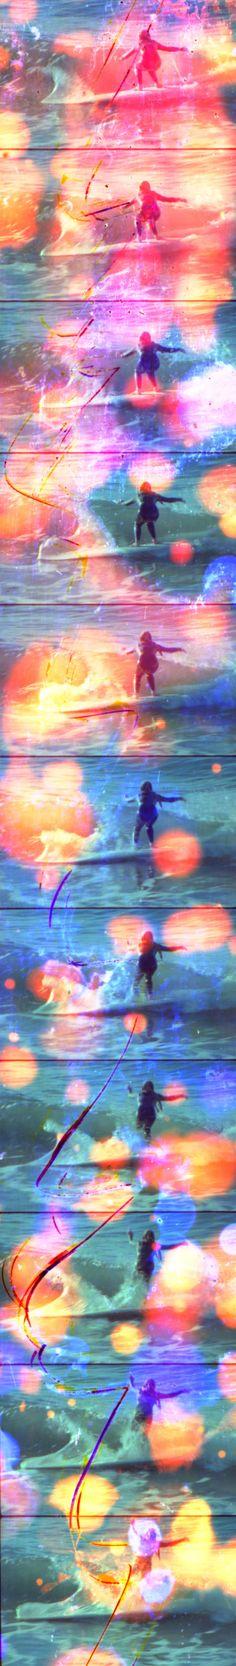 Jennifer West - Dawn Surf Jellybowl Filmstrip 2  2011 Archival inkjet print 221 x 36 cm